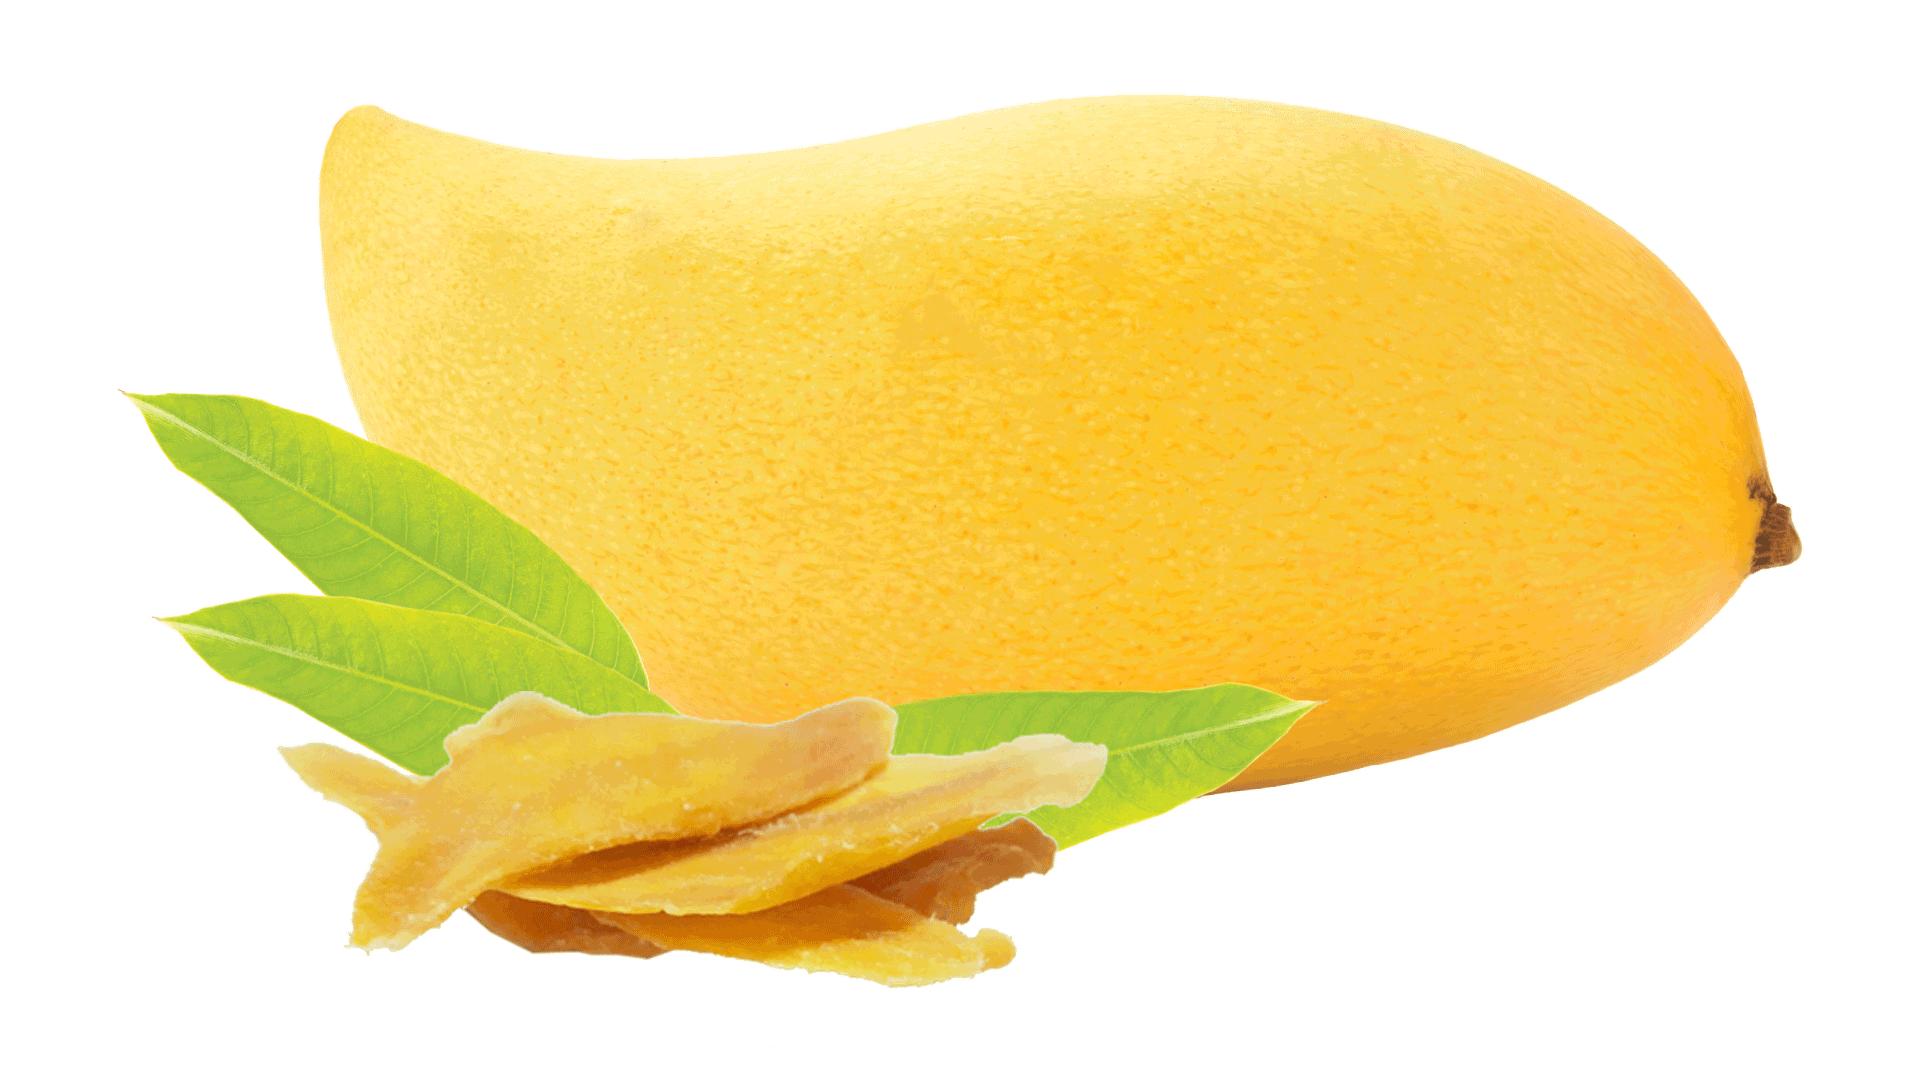 Laithai snack healthy snacks. Lemons clipart durian fruit